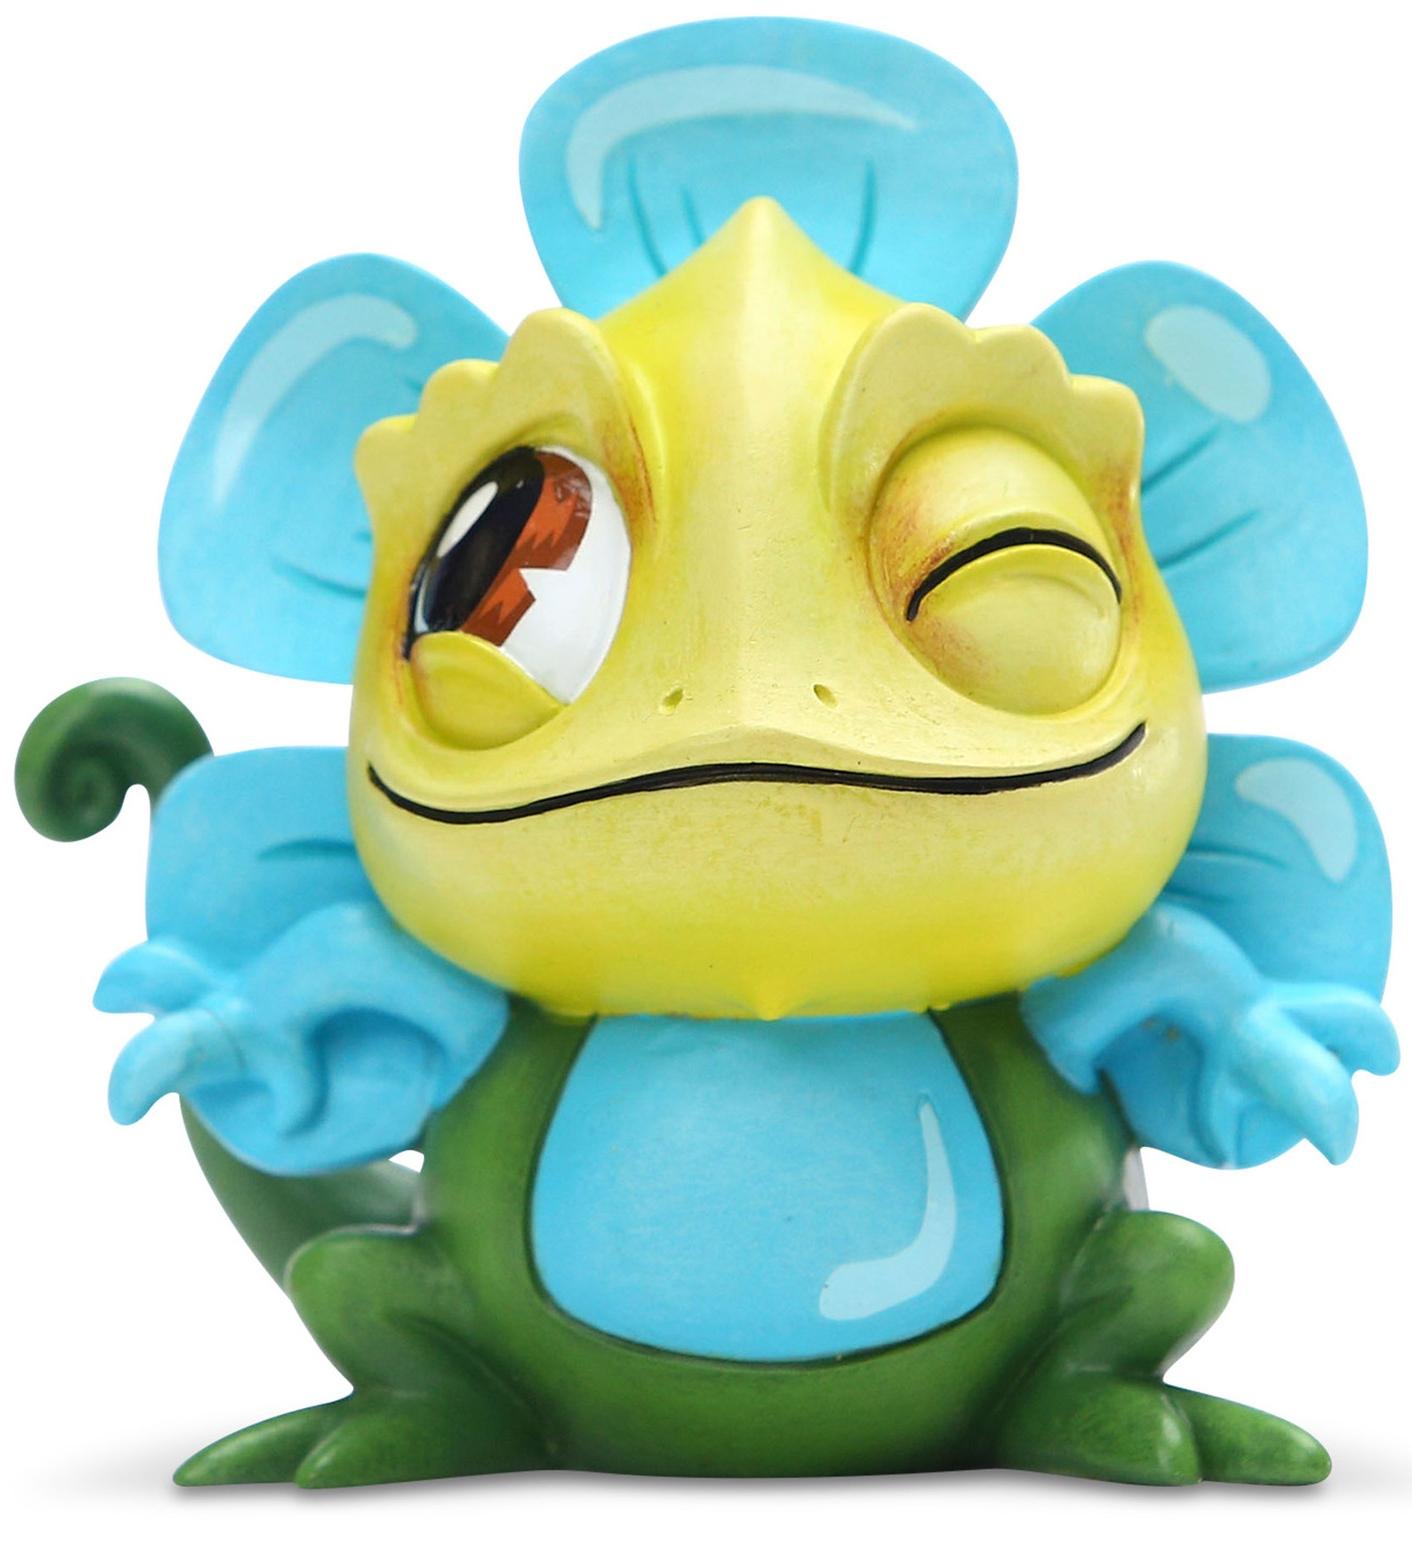 World of Miss Mindy 6003773N Pascal Figurine